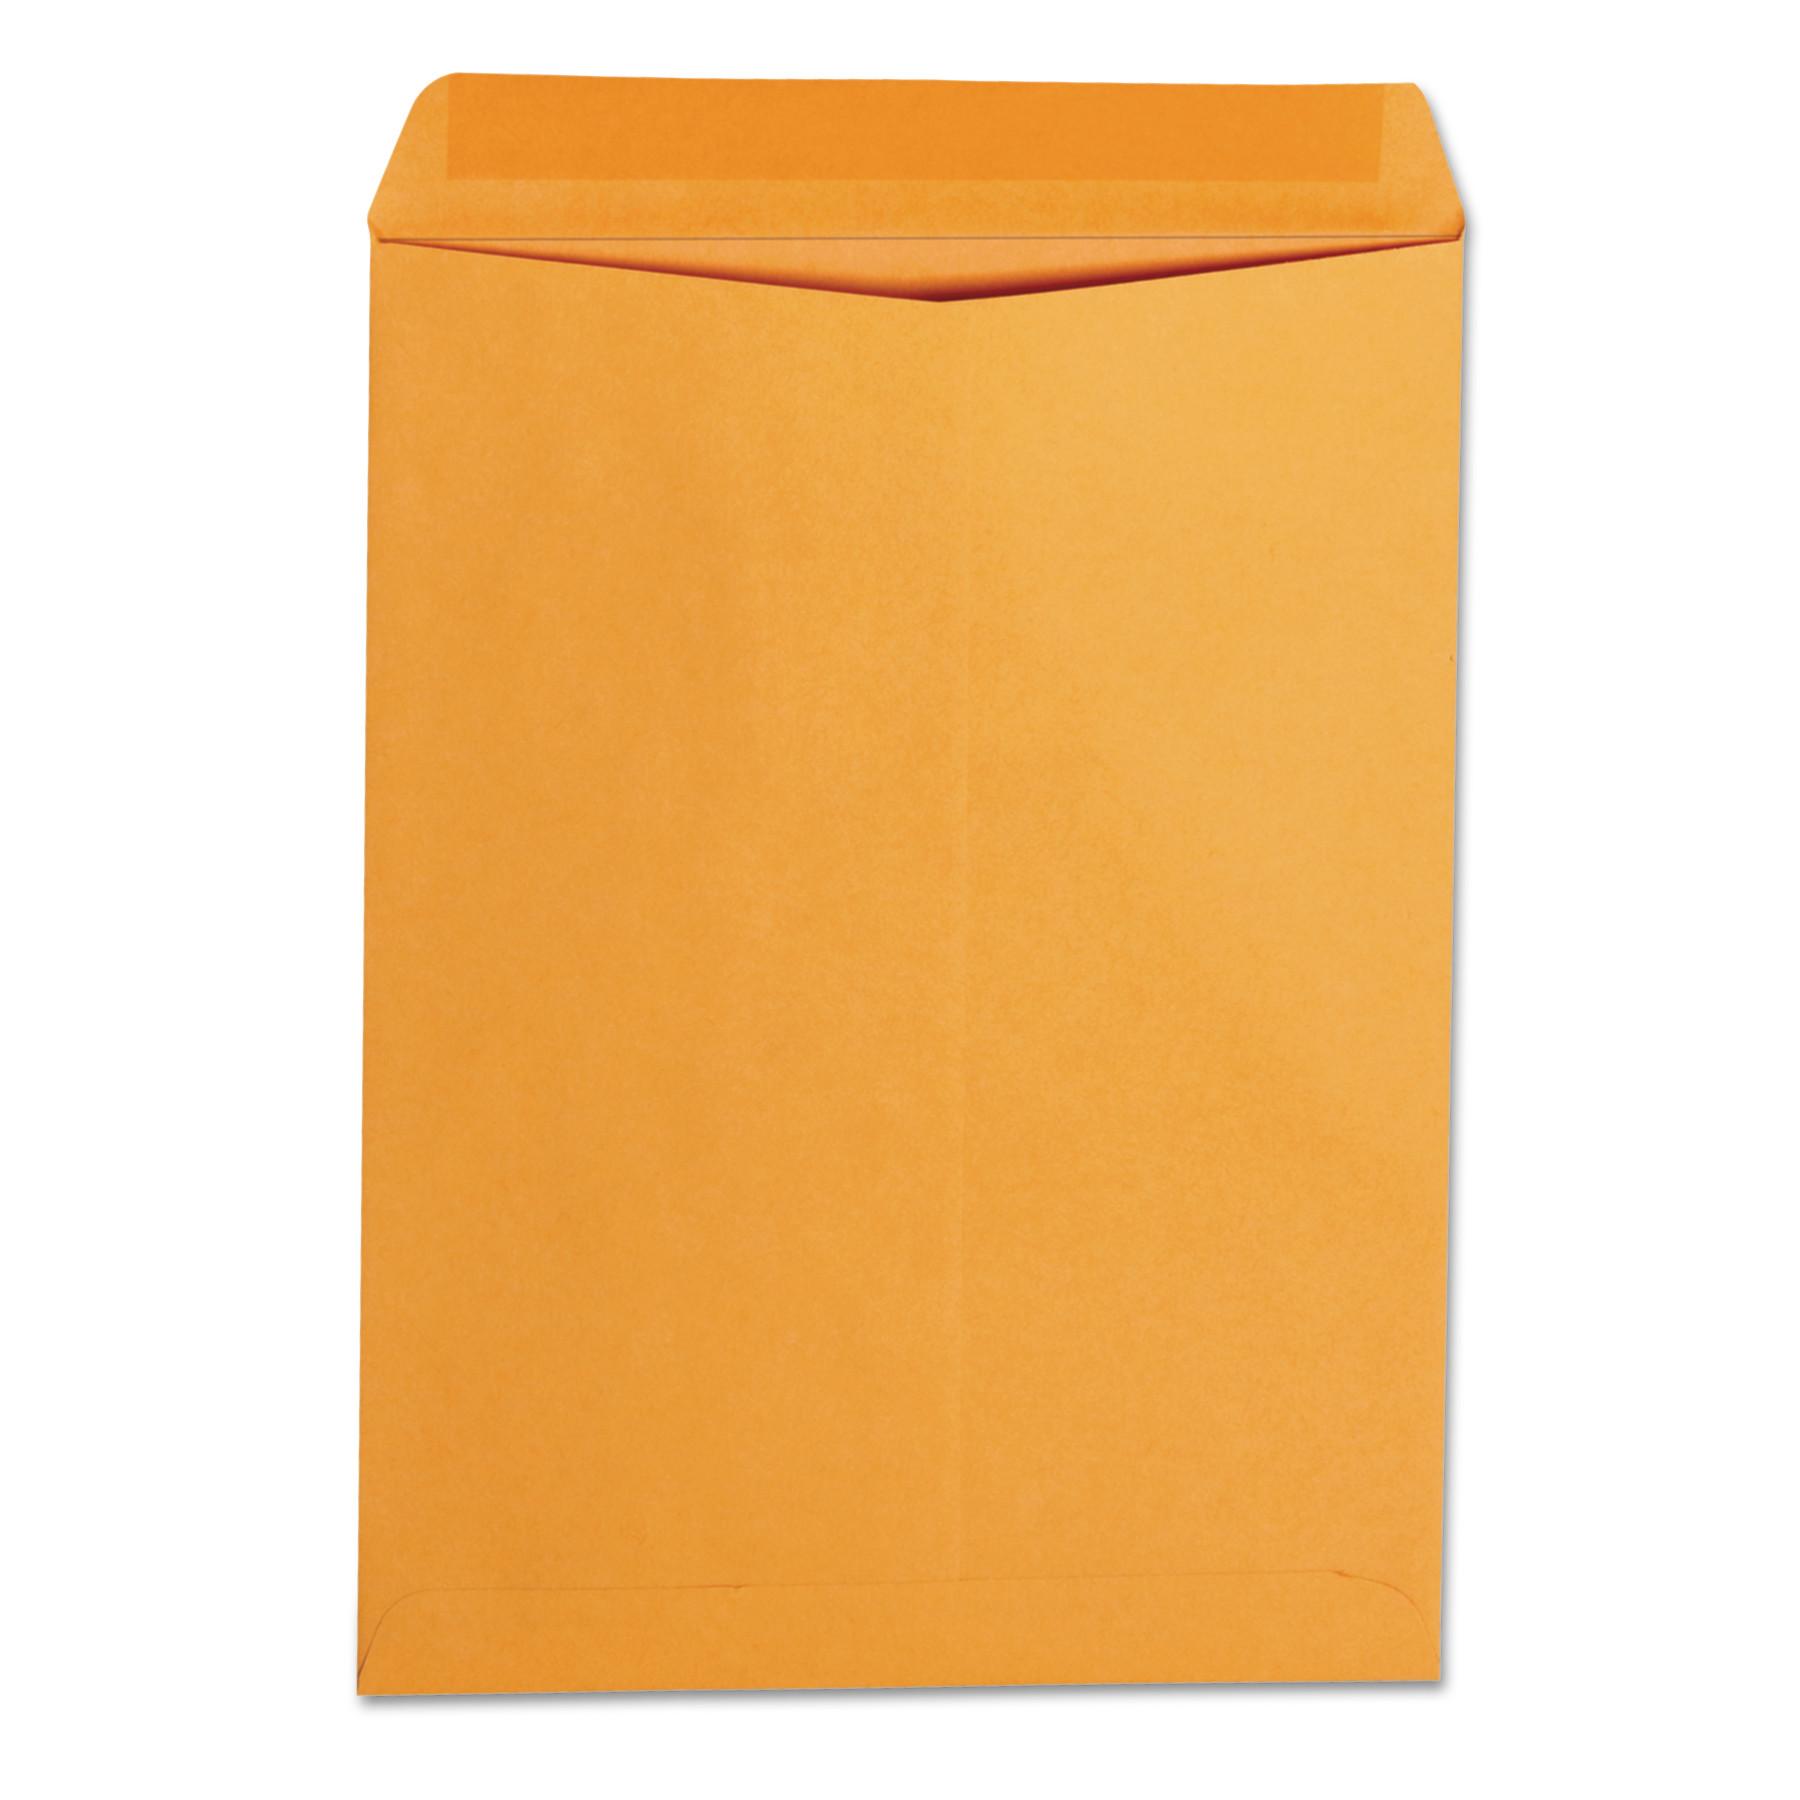 Catalog Envelope, #10 1/2, Square Flap, Gummed Closure, 9 x 12, Brown Kraft, 250/Box